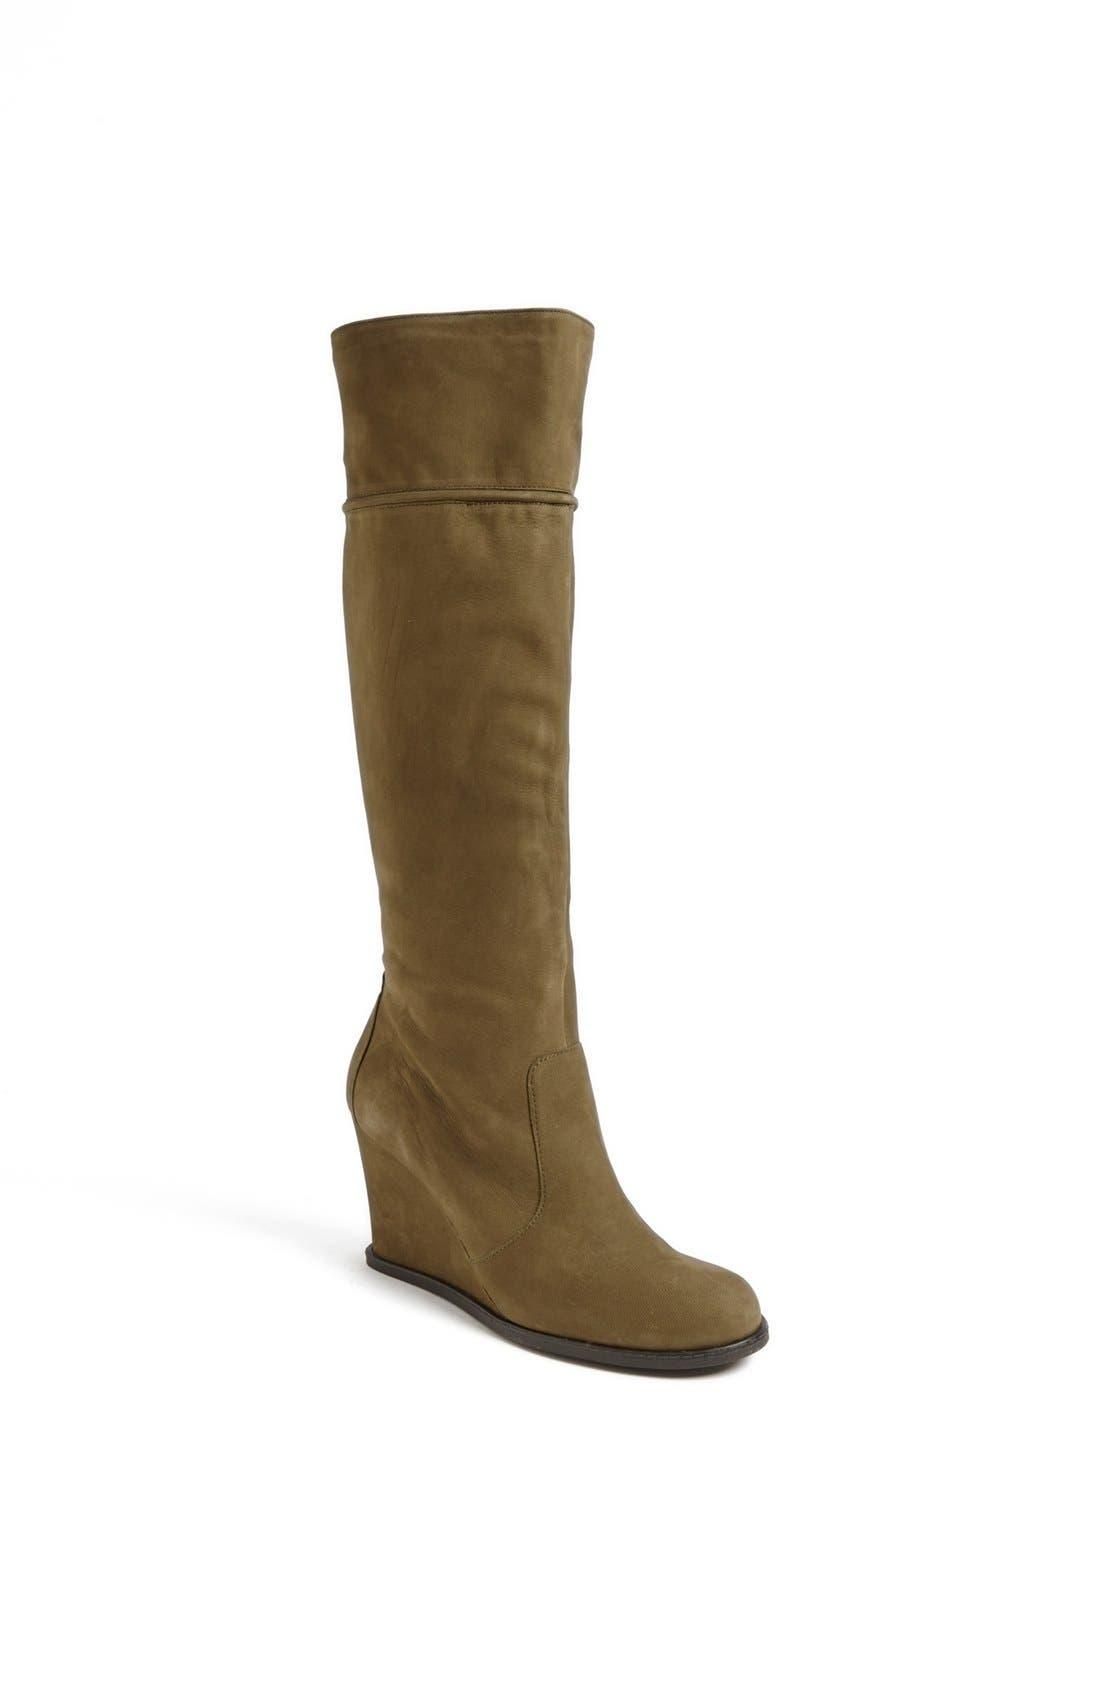 Alternate Image 1 Selected - Me Too 'Brayden' Boot